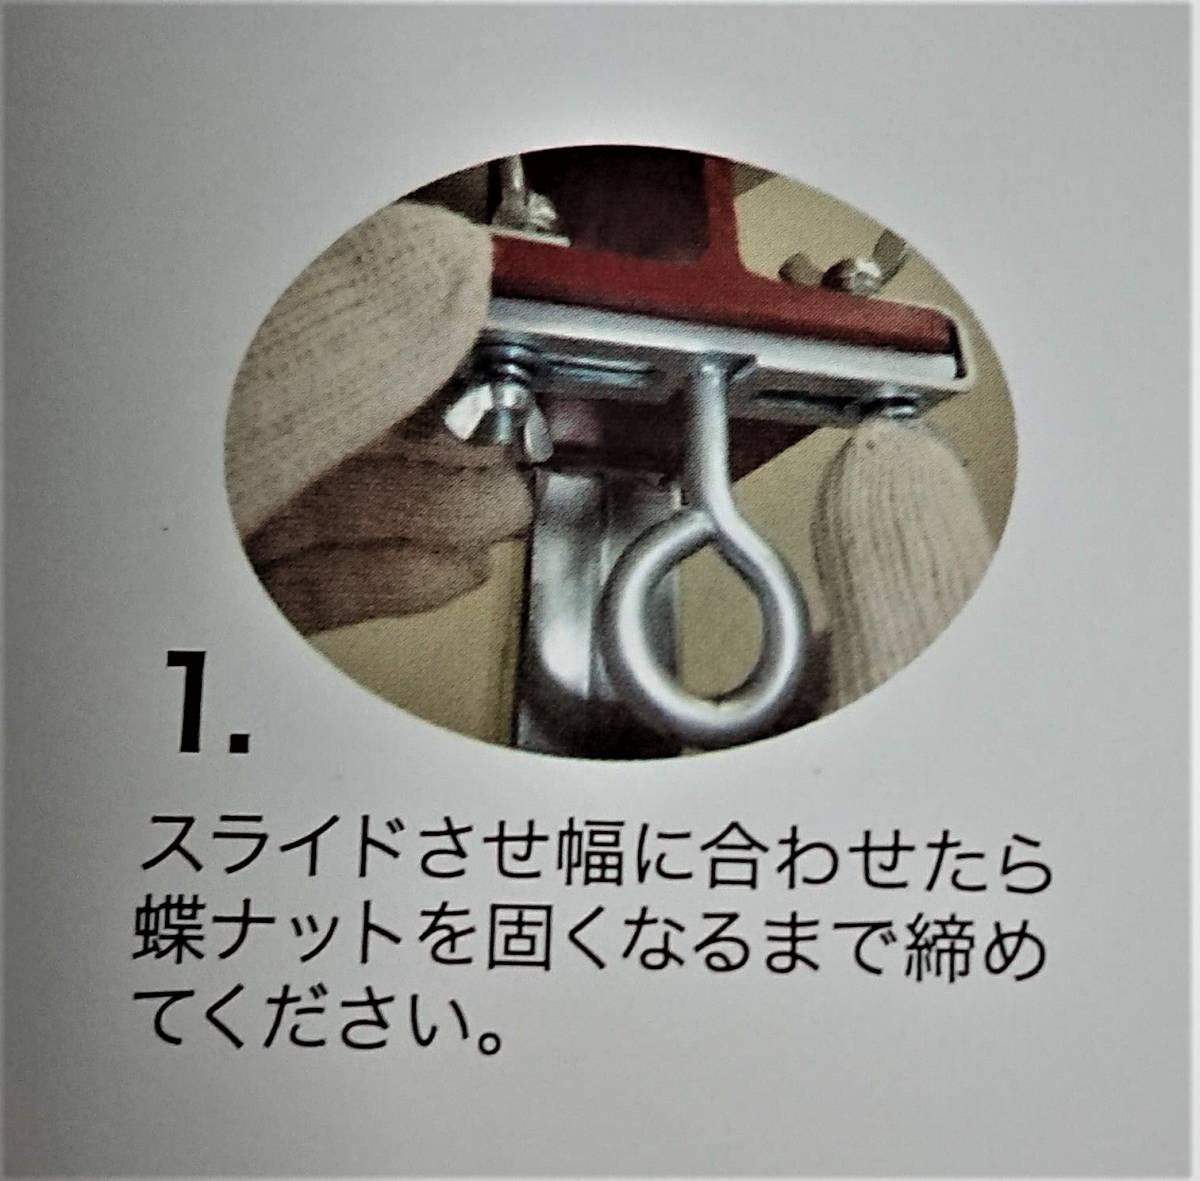 H鋼吊る~す(小・5個セット) H鋼吊り金具 H鋼吊るす ヒートン_画像2